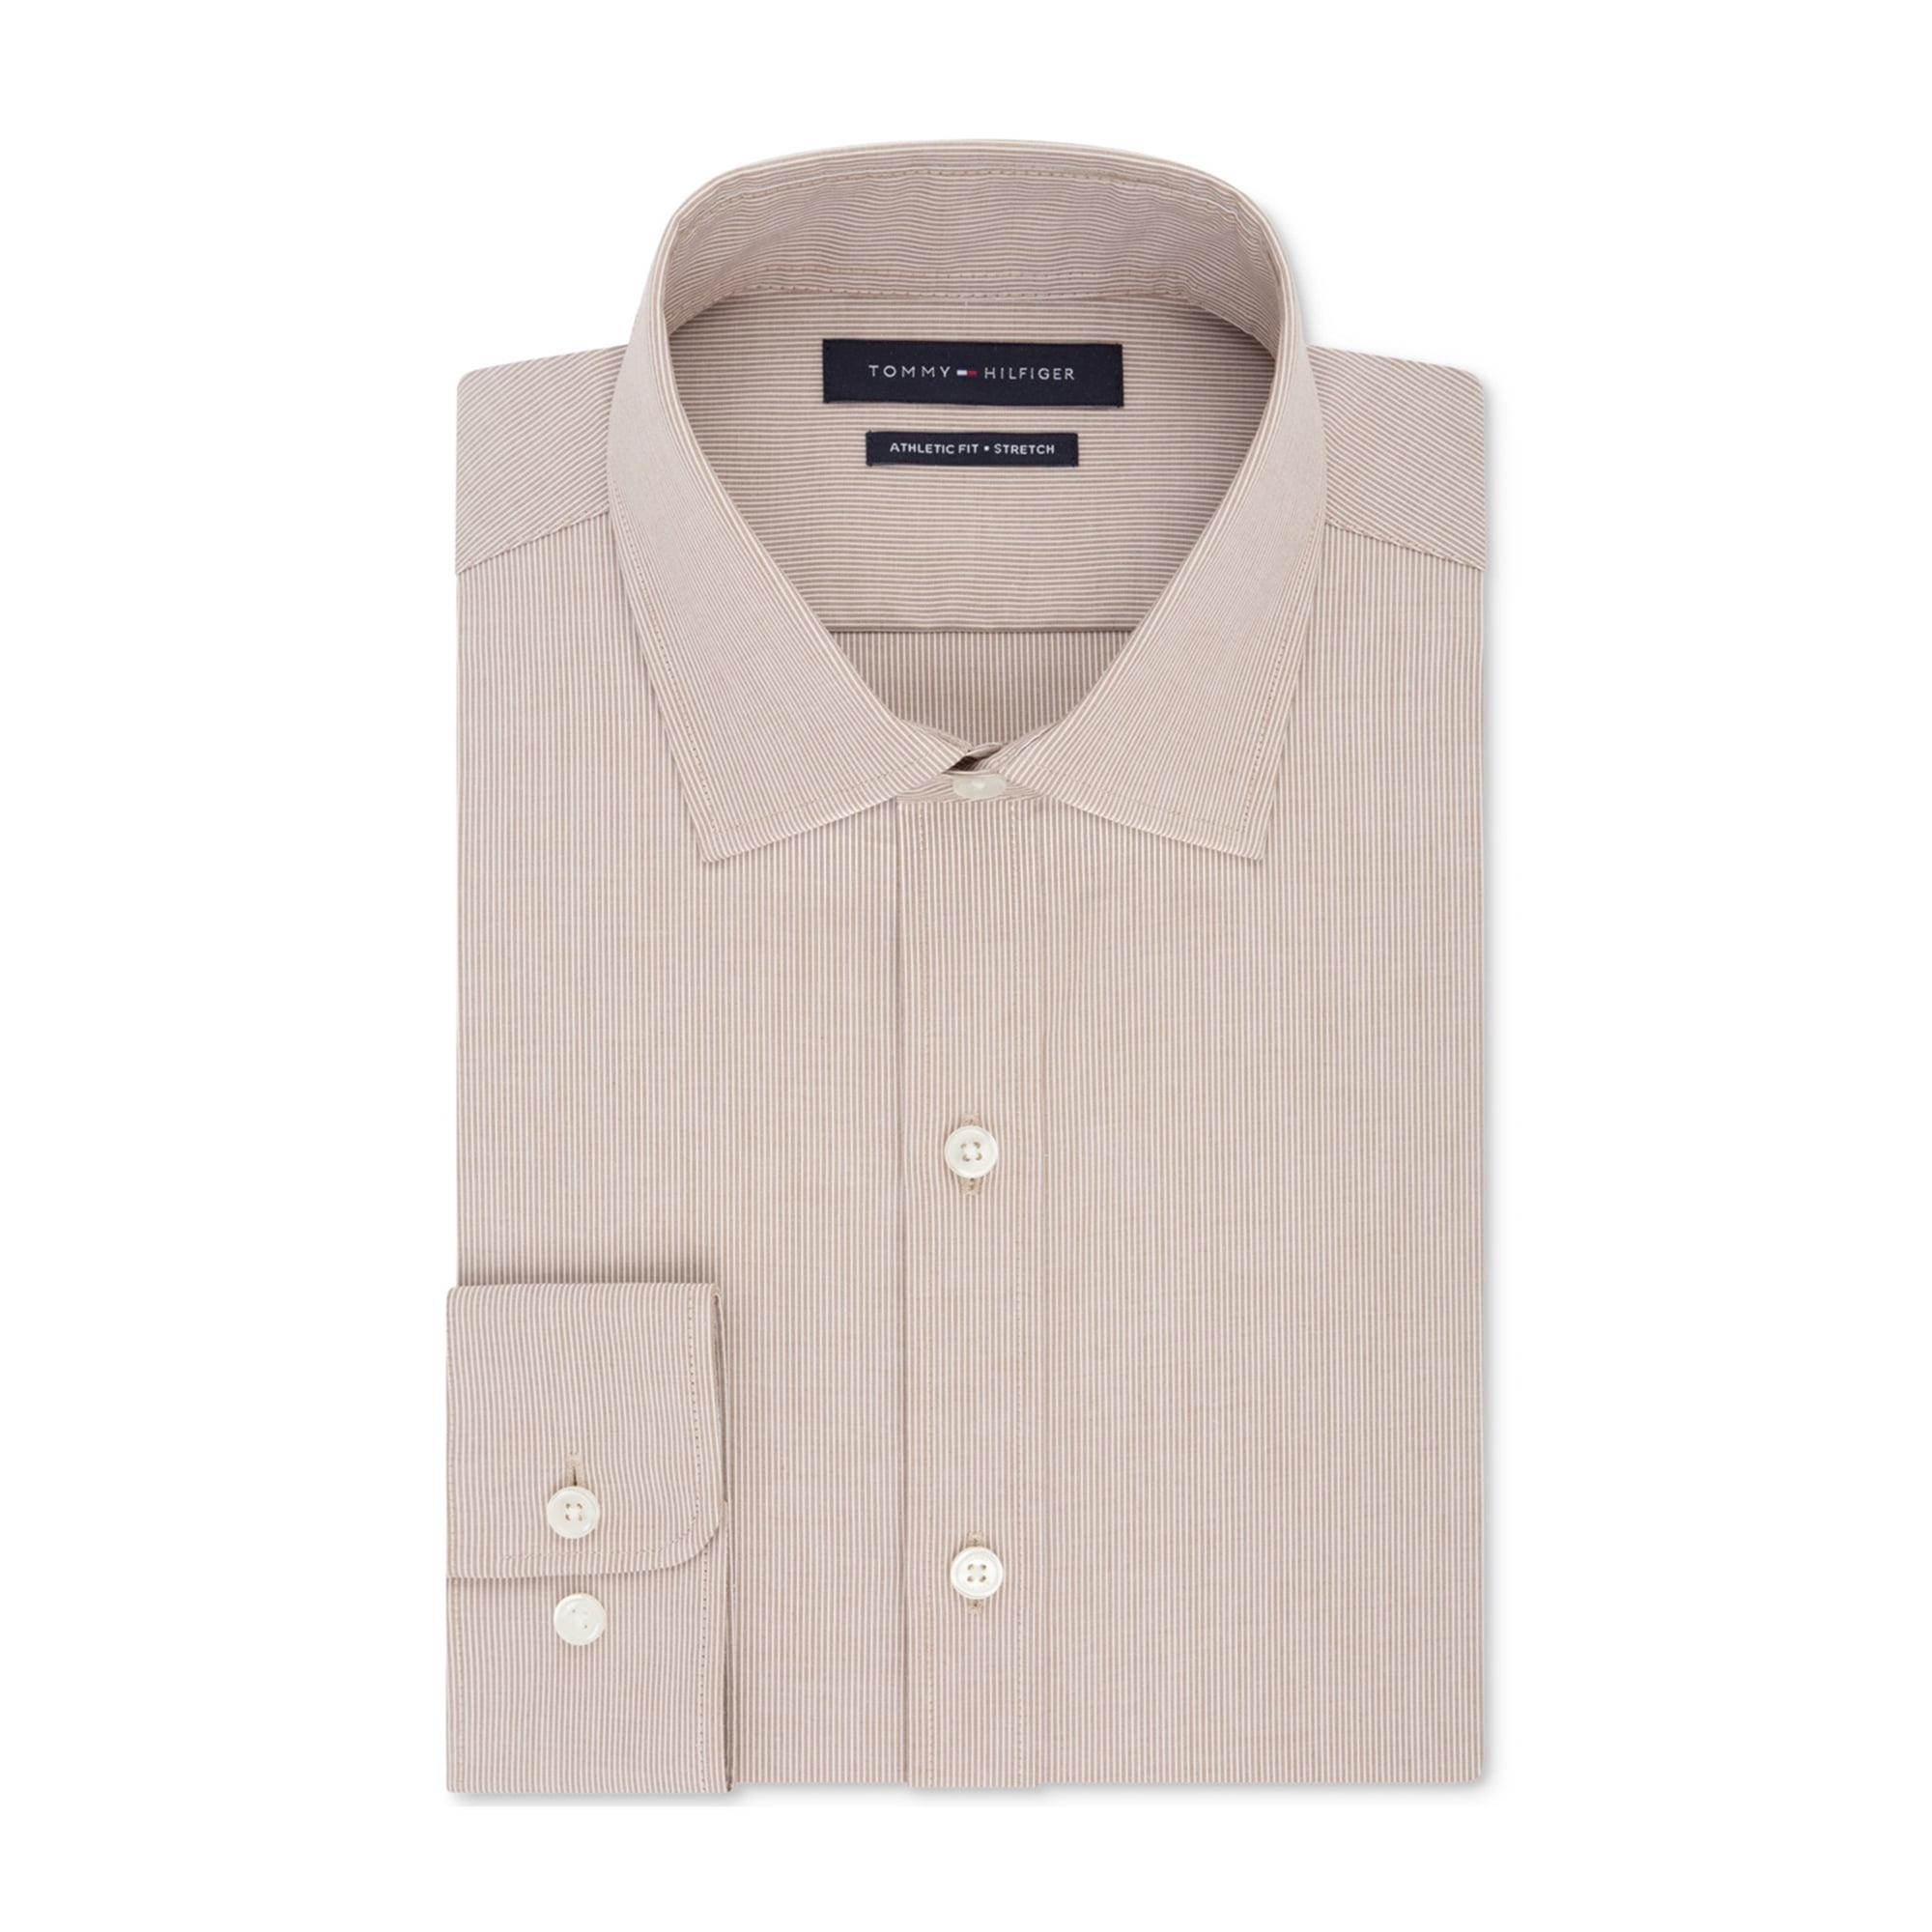 6ed4e999 Tommy Hilfiger Mens Fitted Performance Flex Button Up Dress Shirt pecan 15  1/2 | Walmart Canada